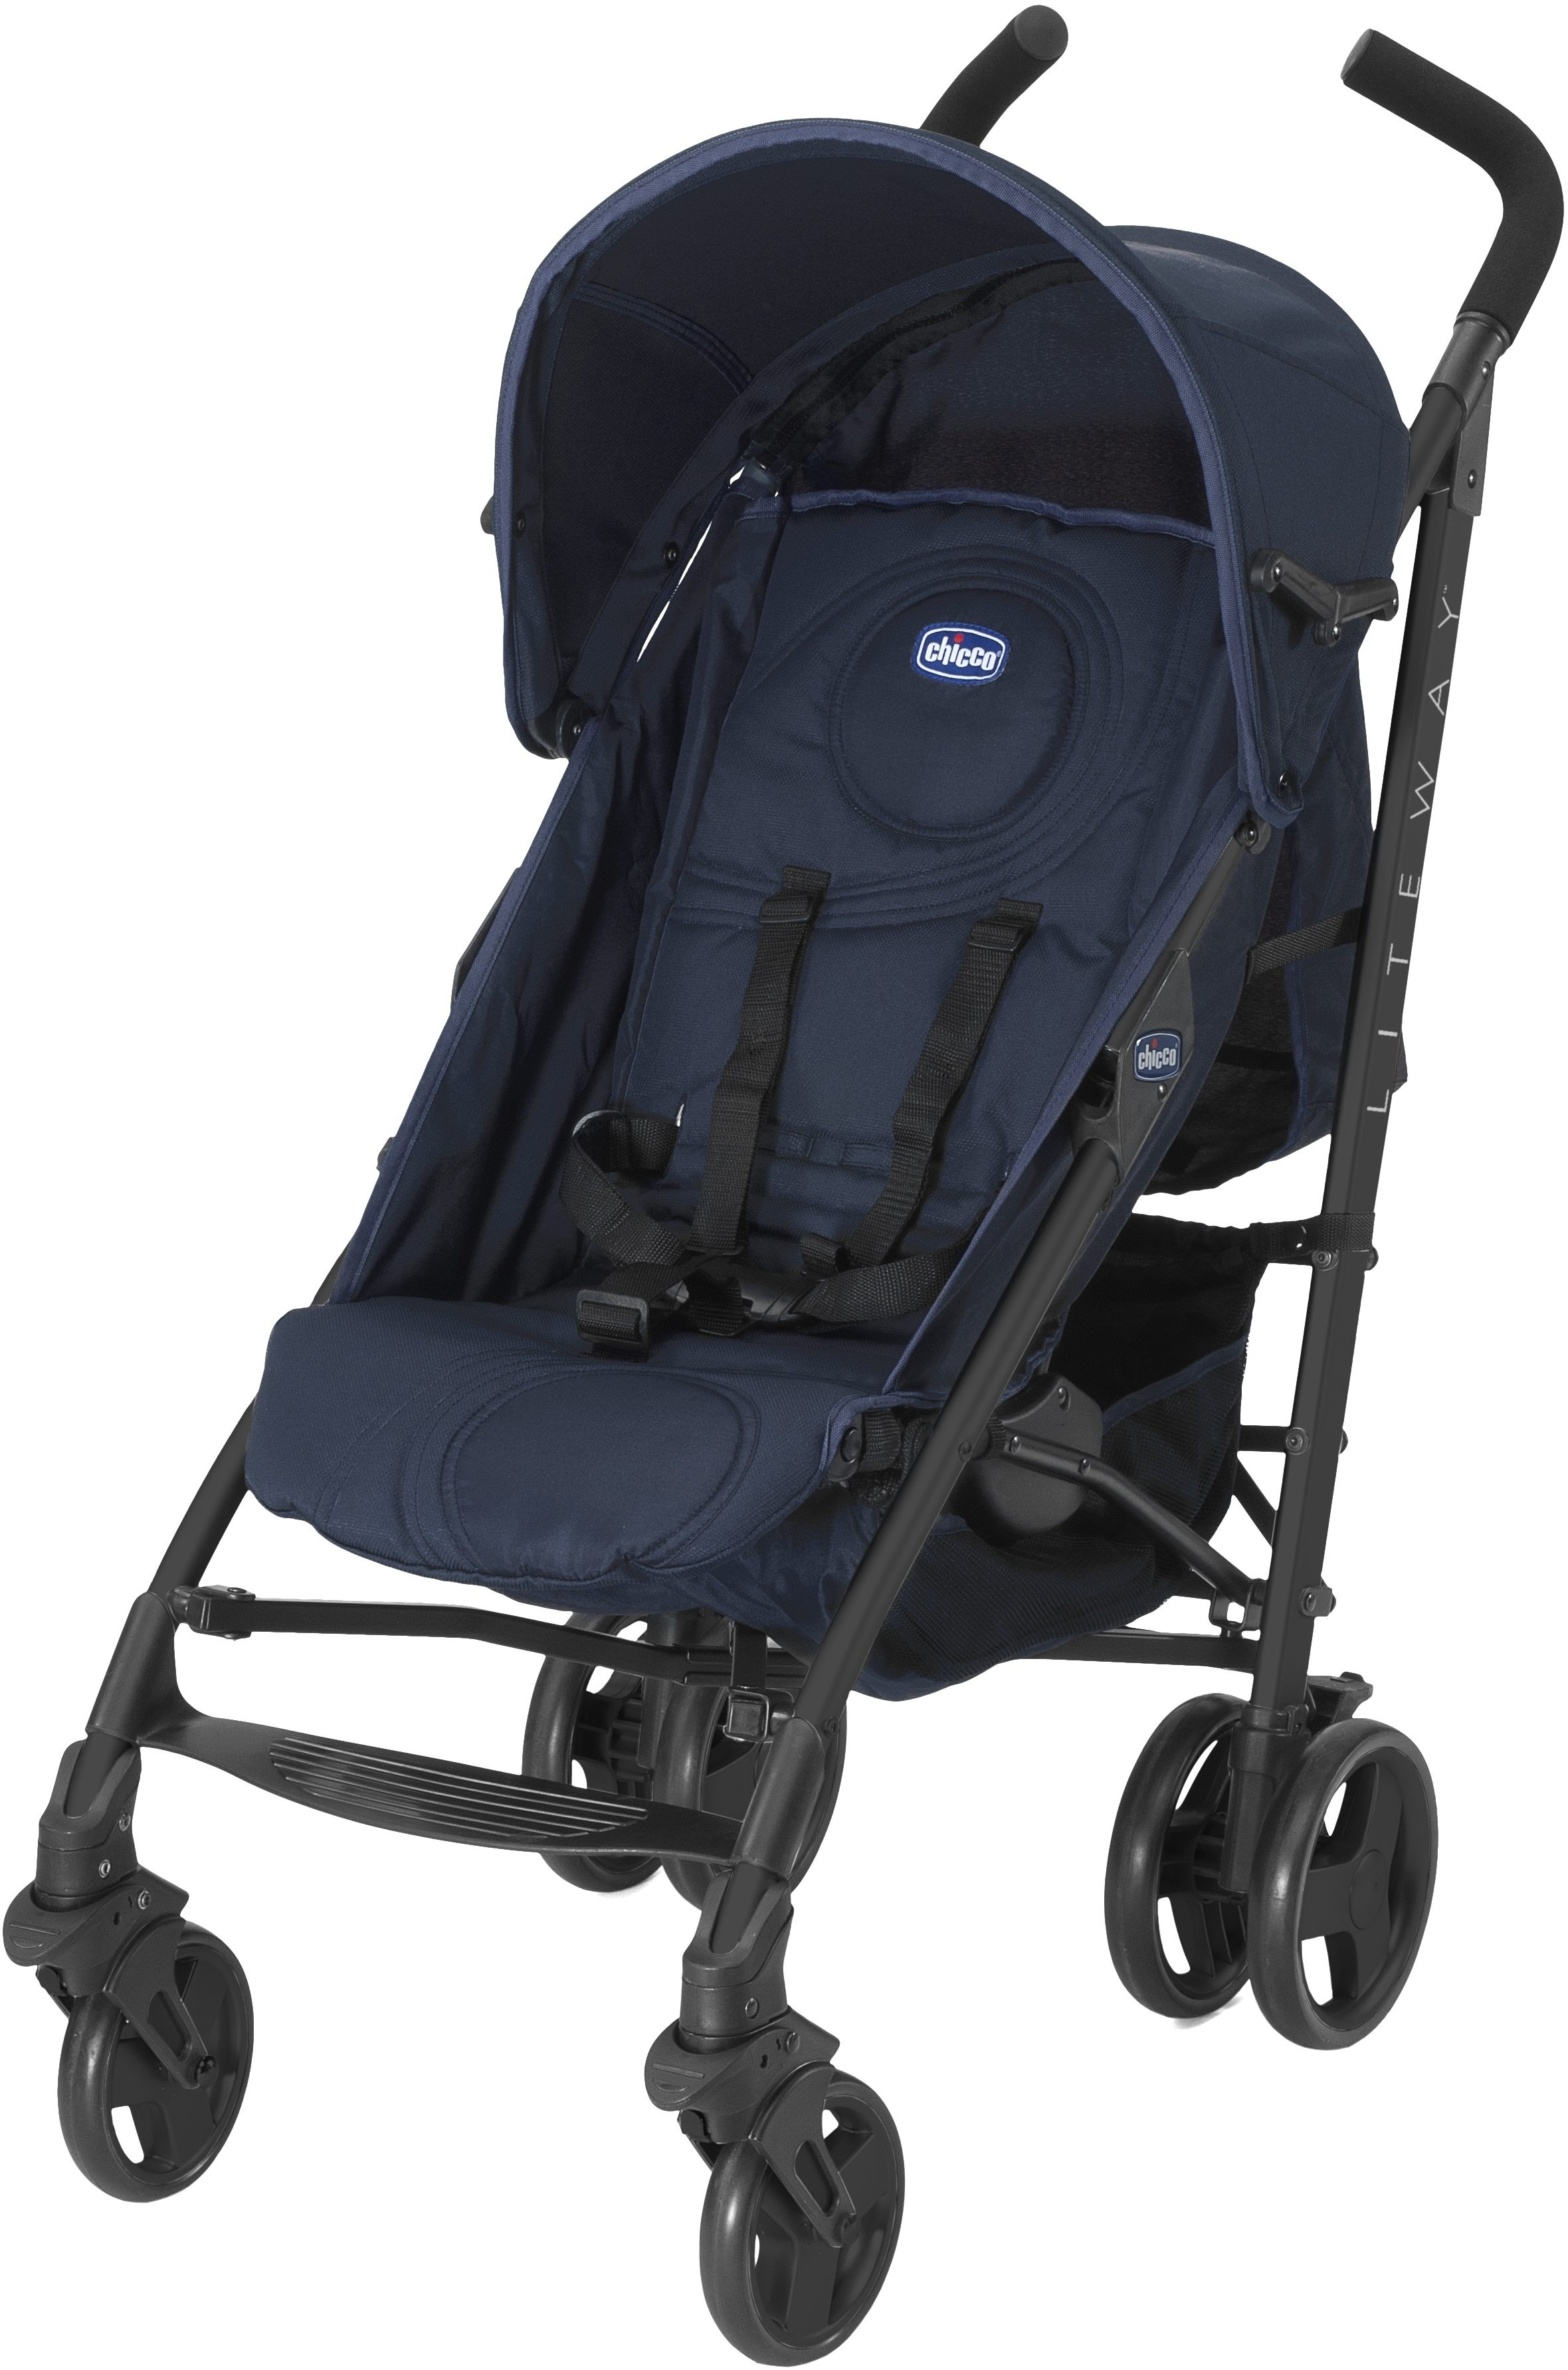 Chicco Liteway Stroller Buy Stroller For 0 3 Years